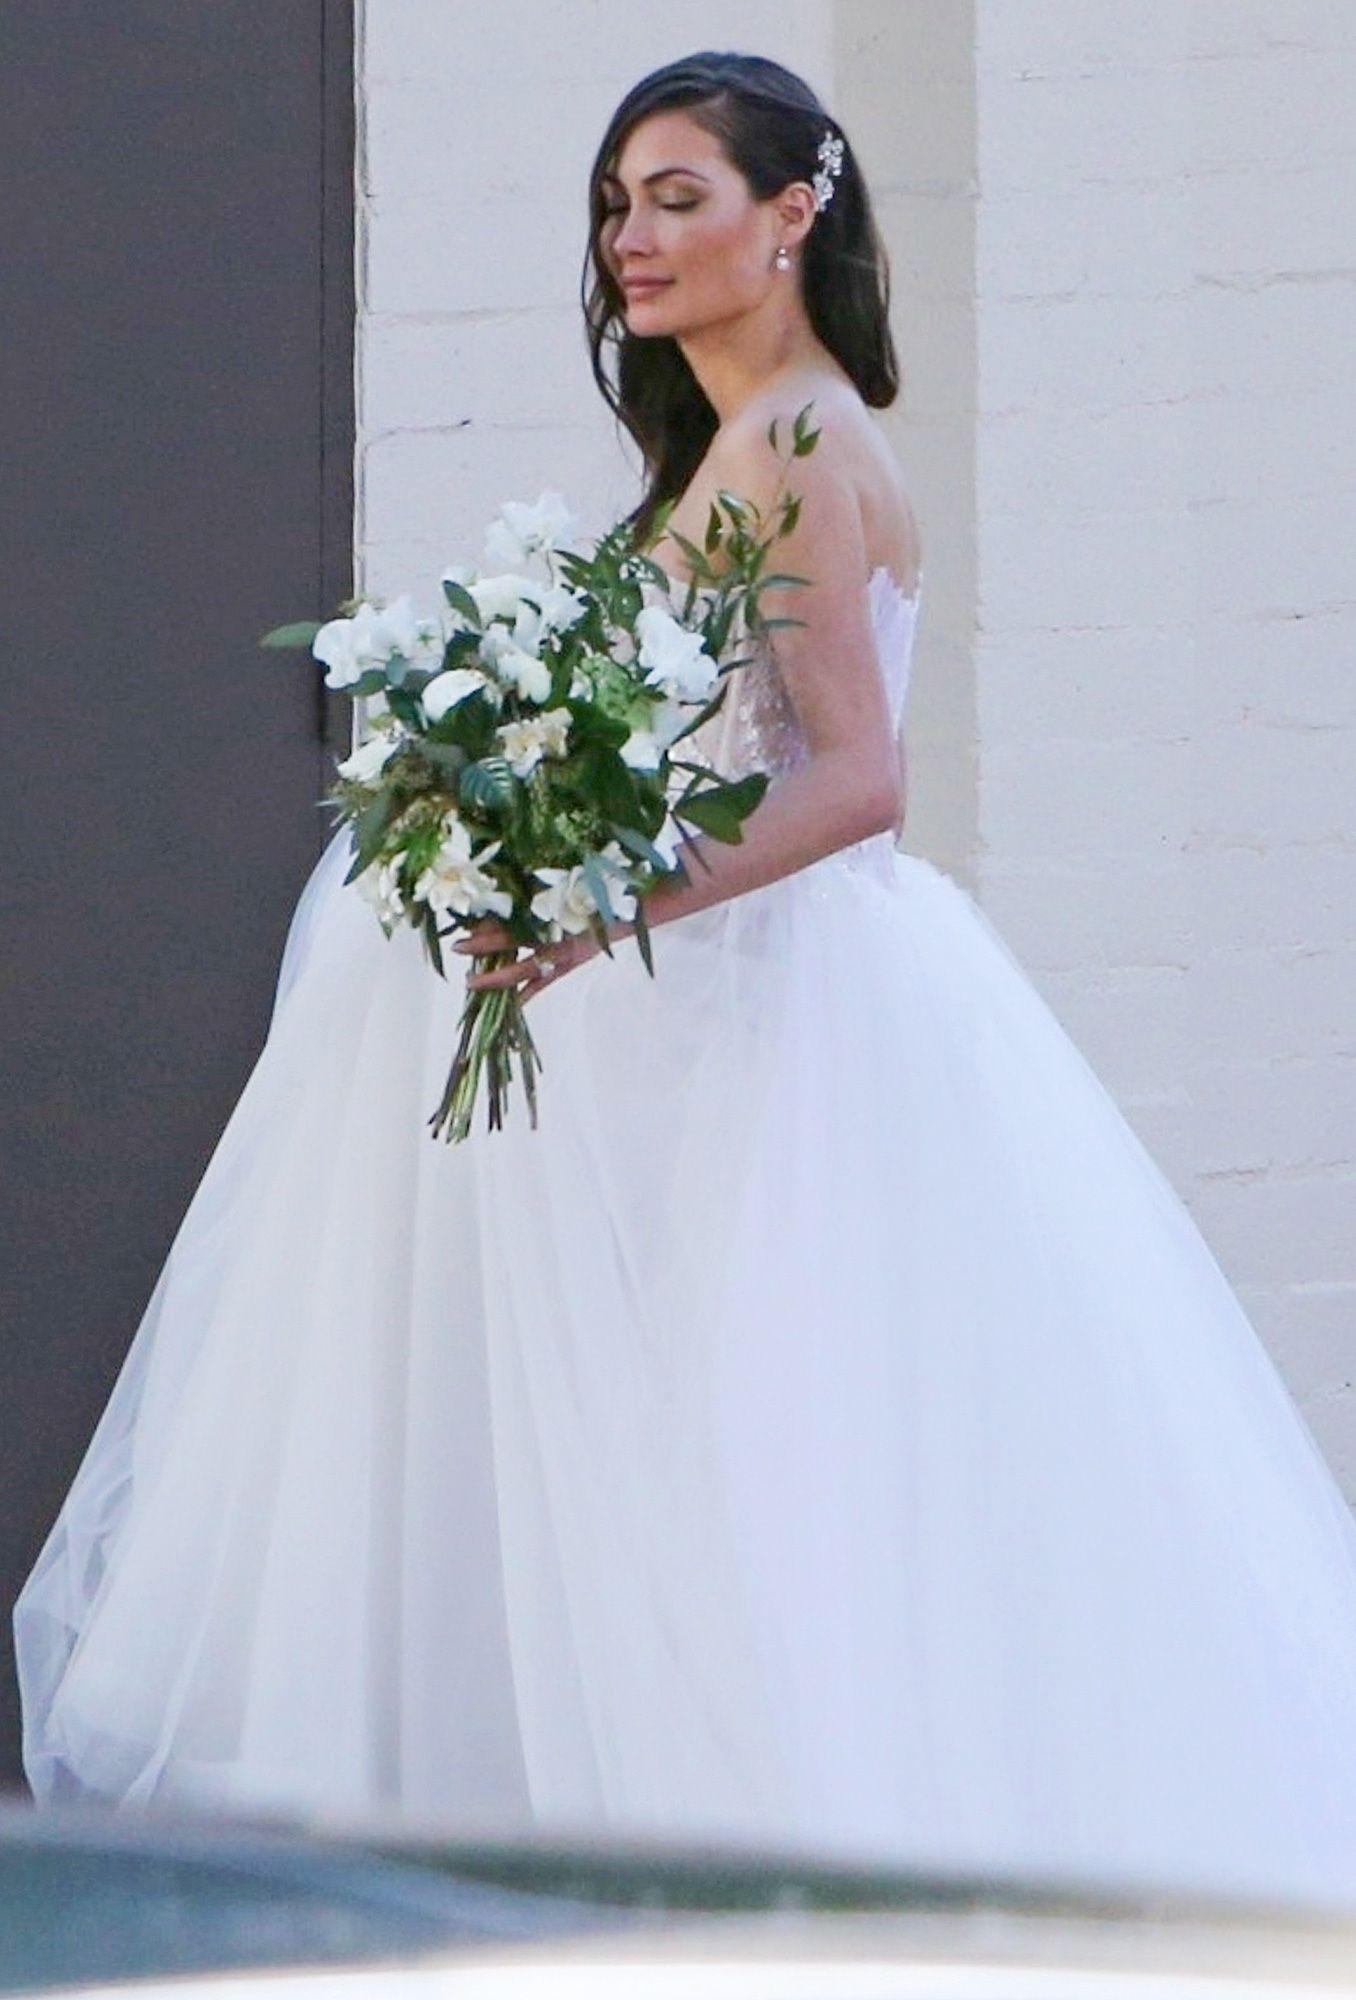 27+ Rebecca wedding dress 90 day fiance ideas in 2021